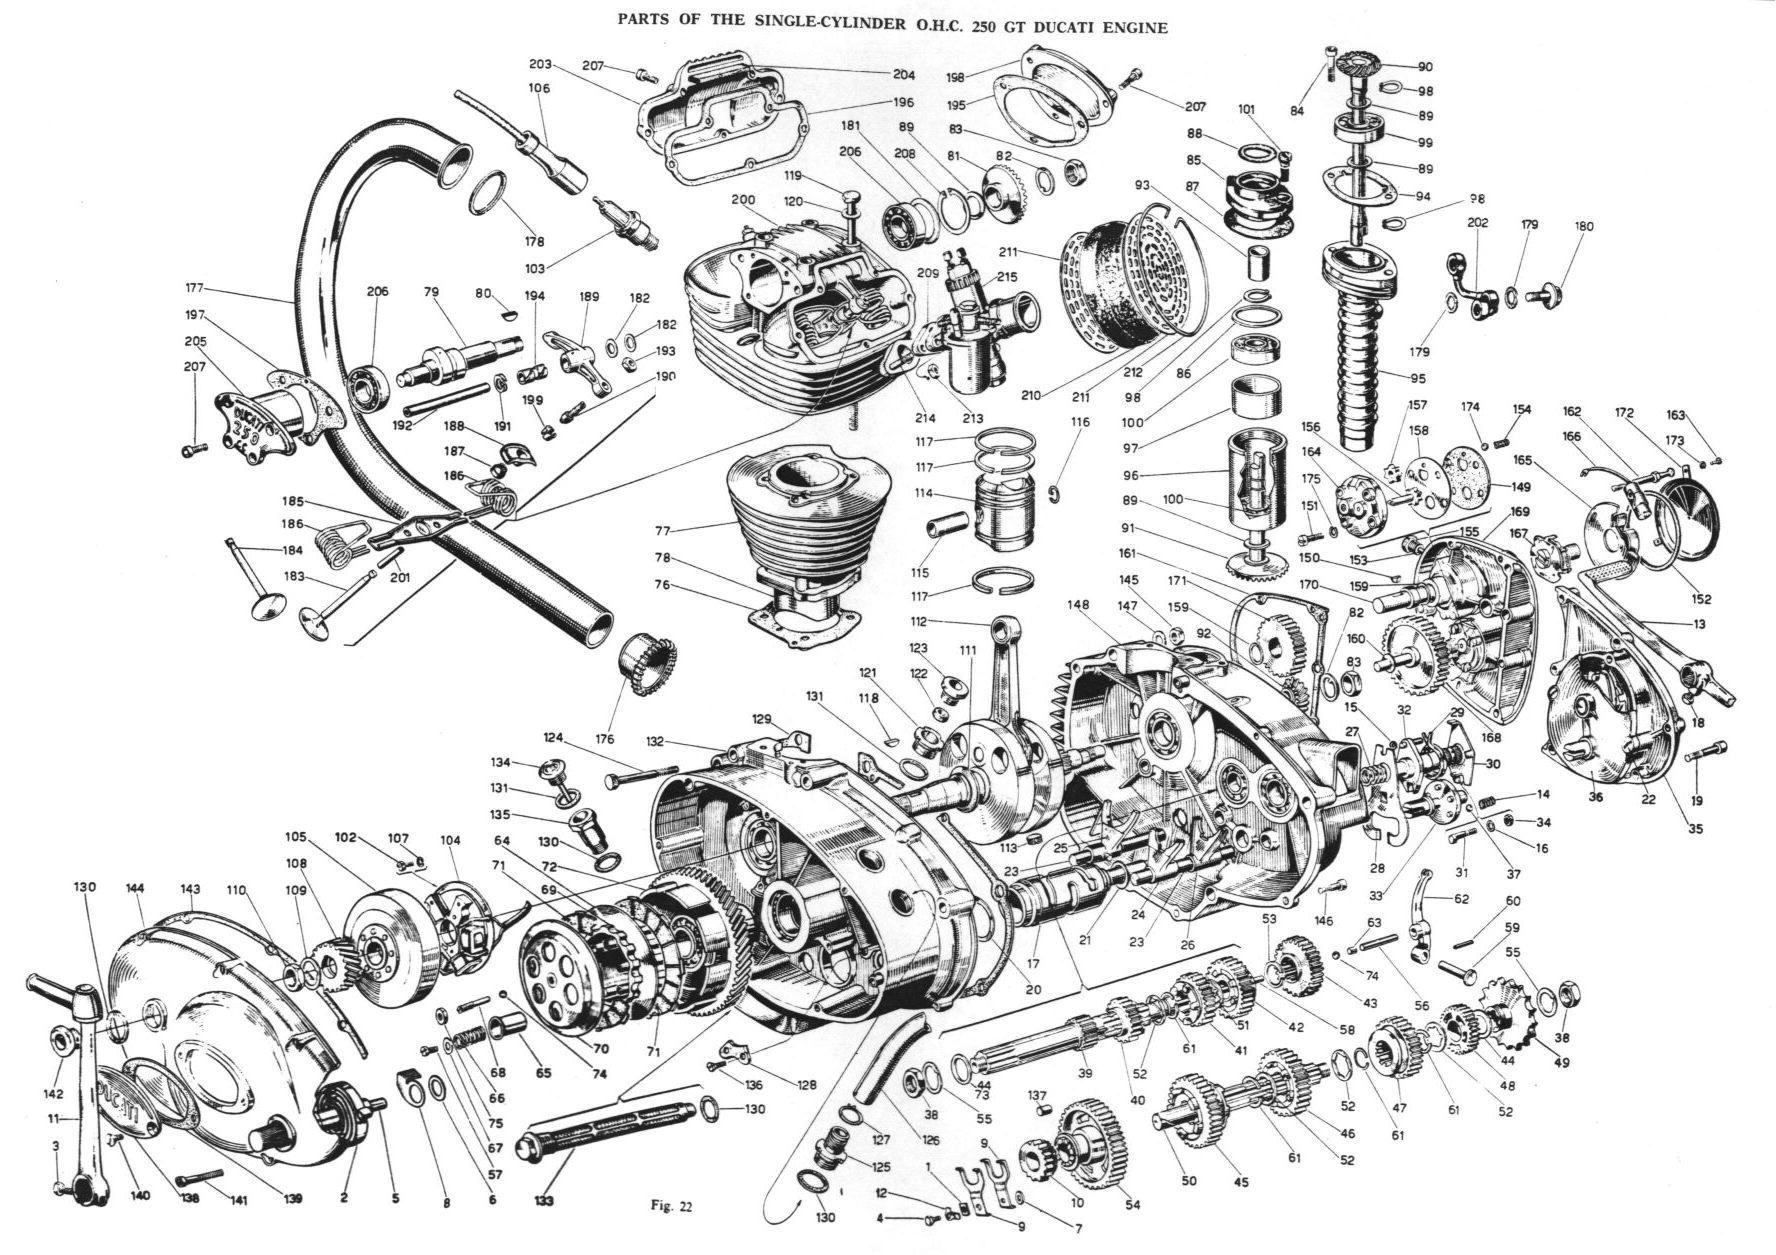 Exploded Single Motor